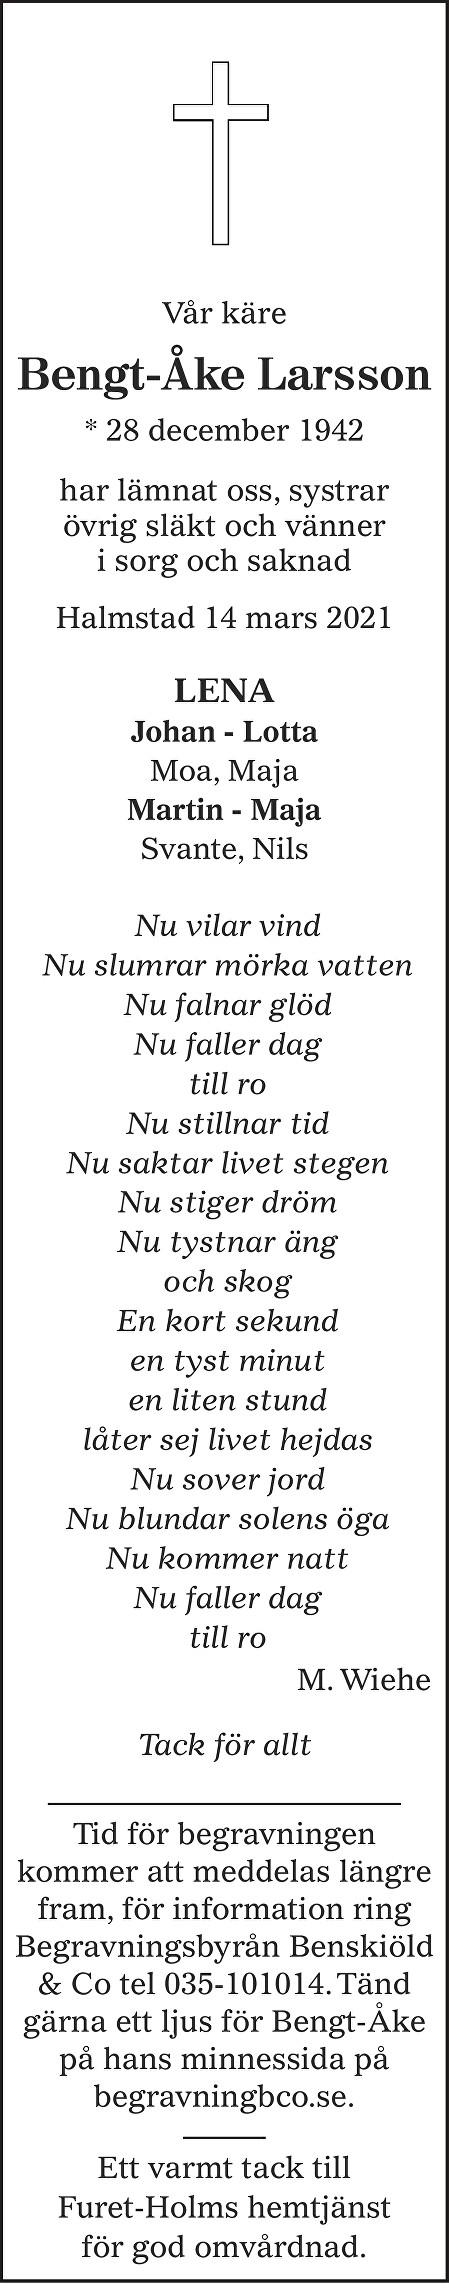 Bengt-Åke Larsson Death notice